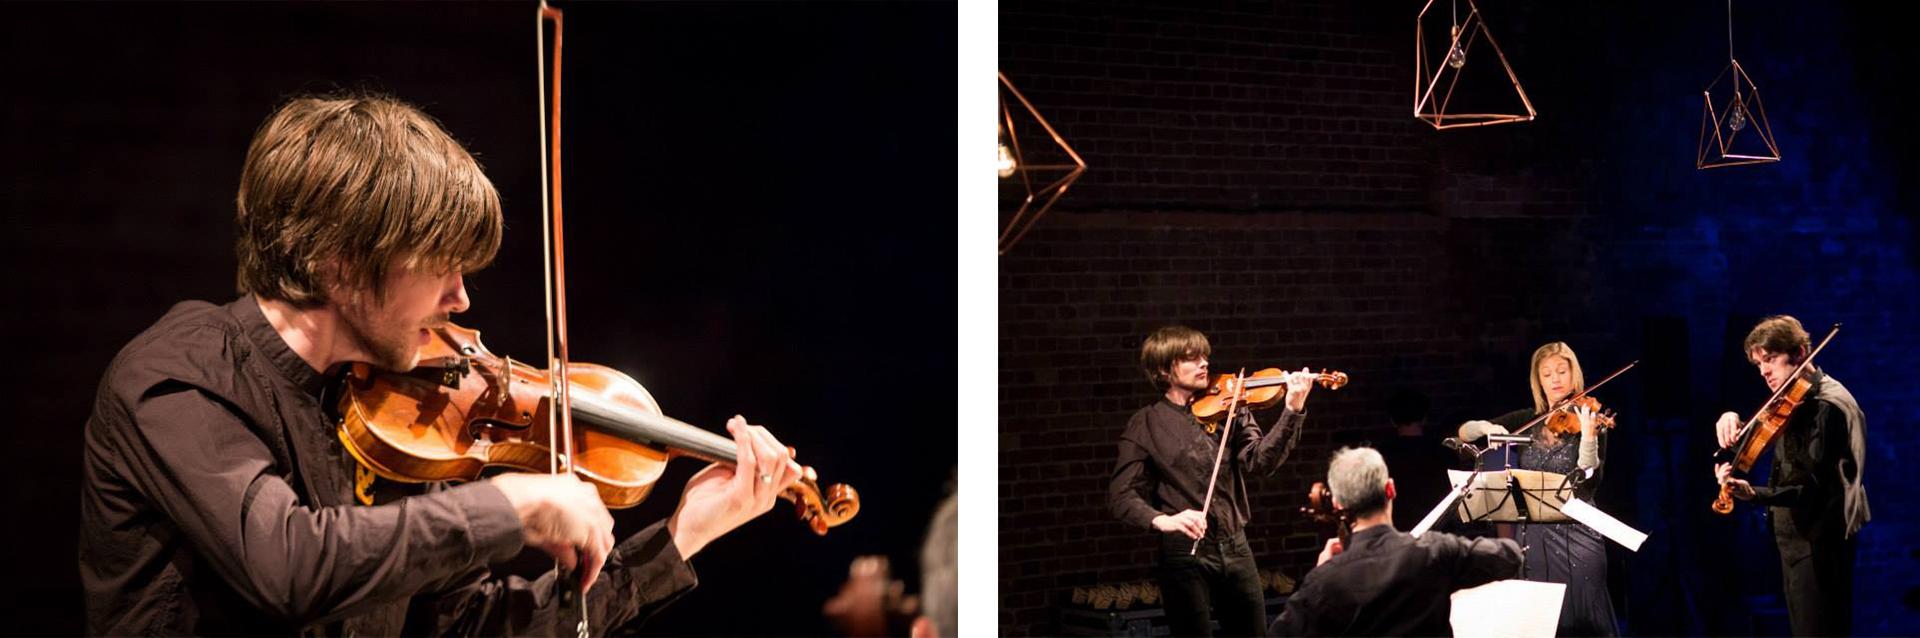 Sacconi Strings Quartet